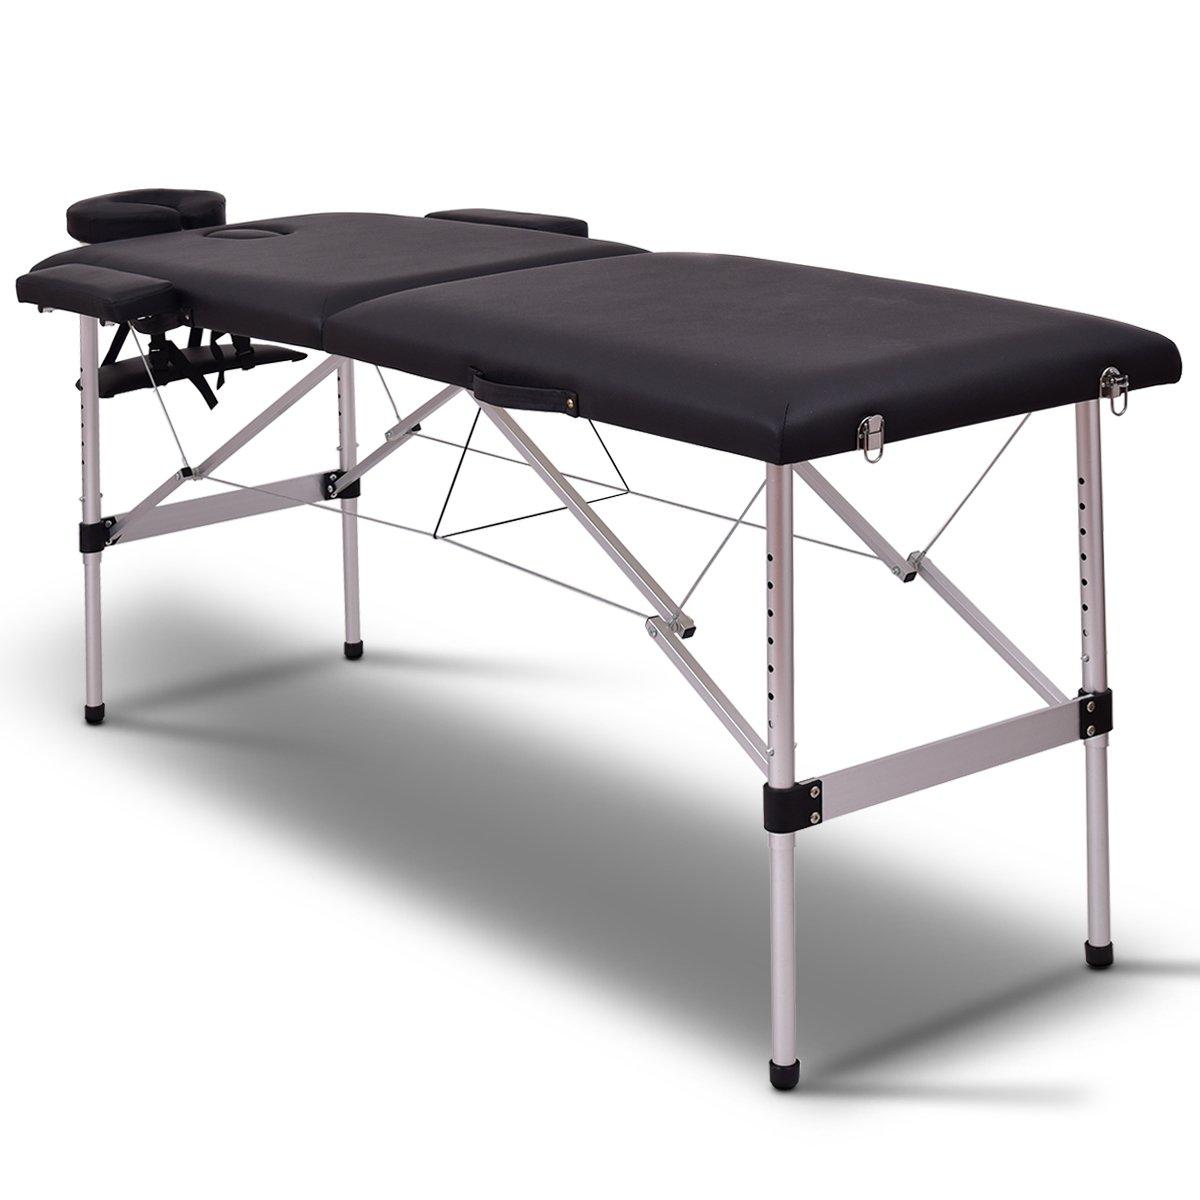 Giantex Portable Massage Table Aluminum